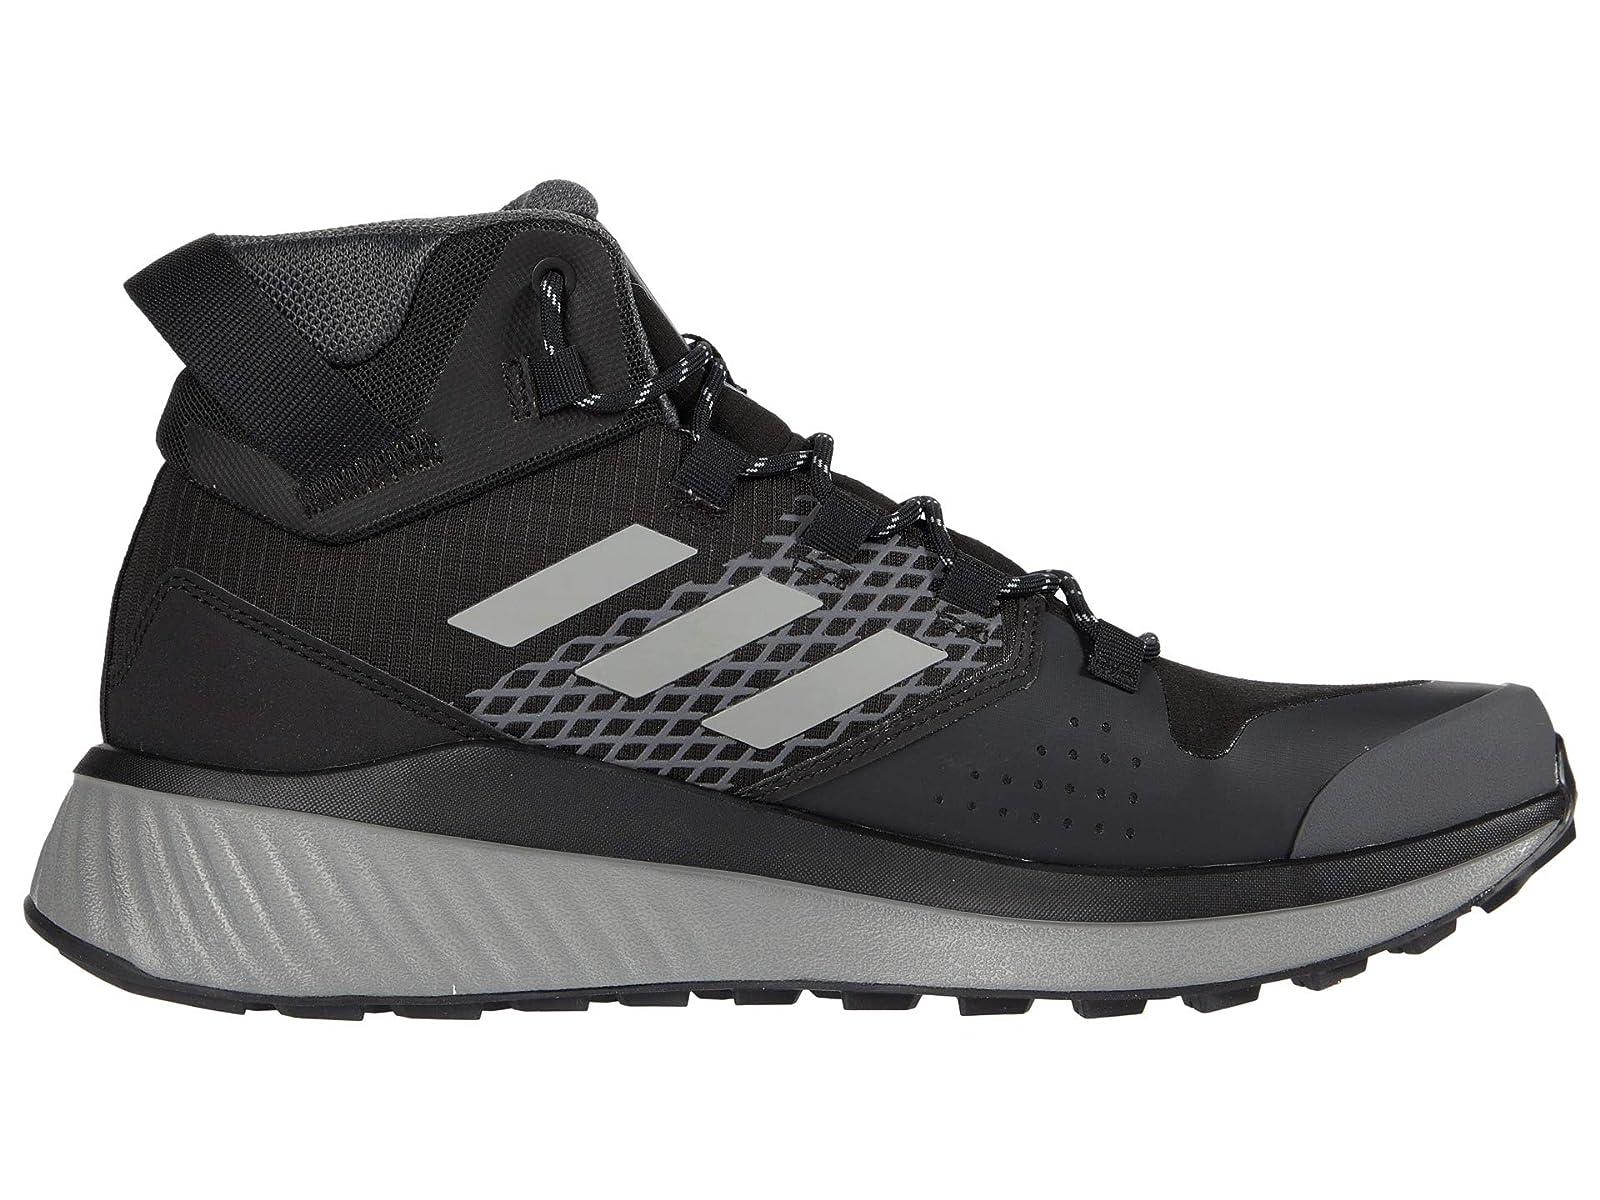 Mannes-Schuhe-Adidas-Outdoor-TERREX-folgian-Hiker-Mid-GTX Indexbild 7